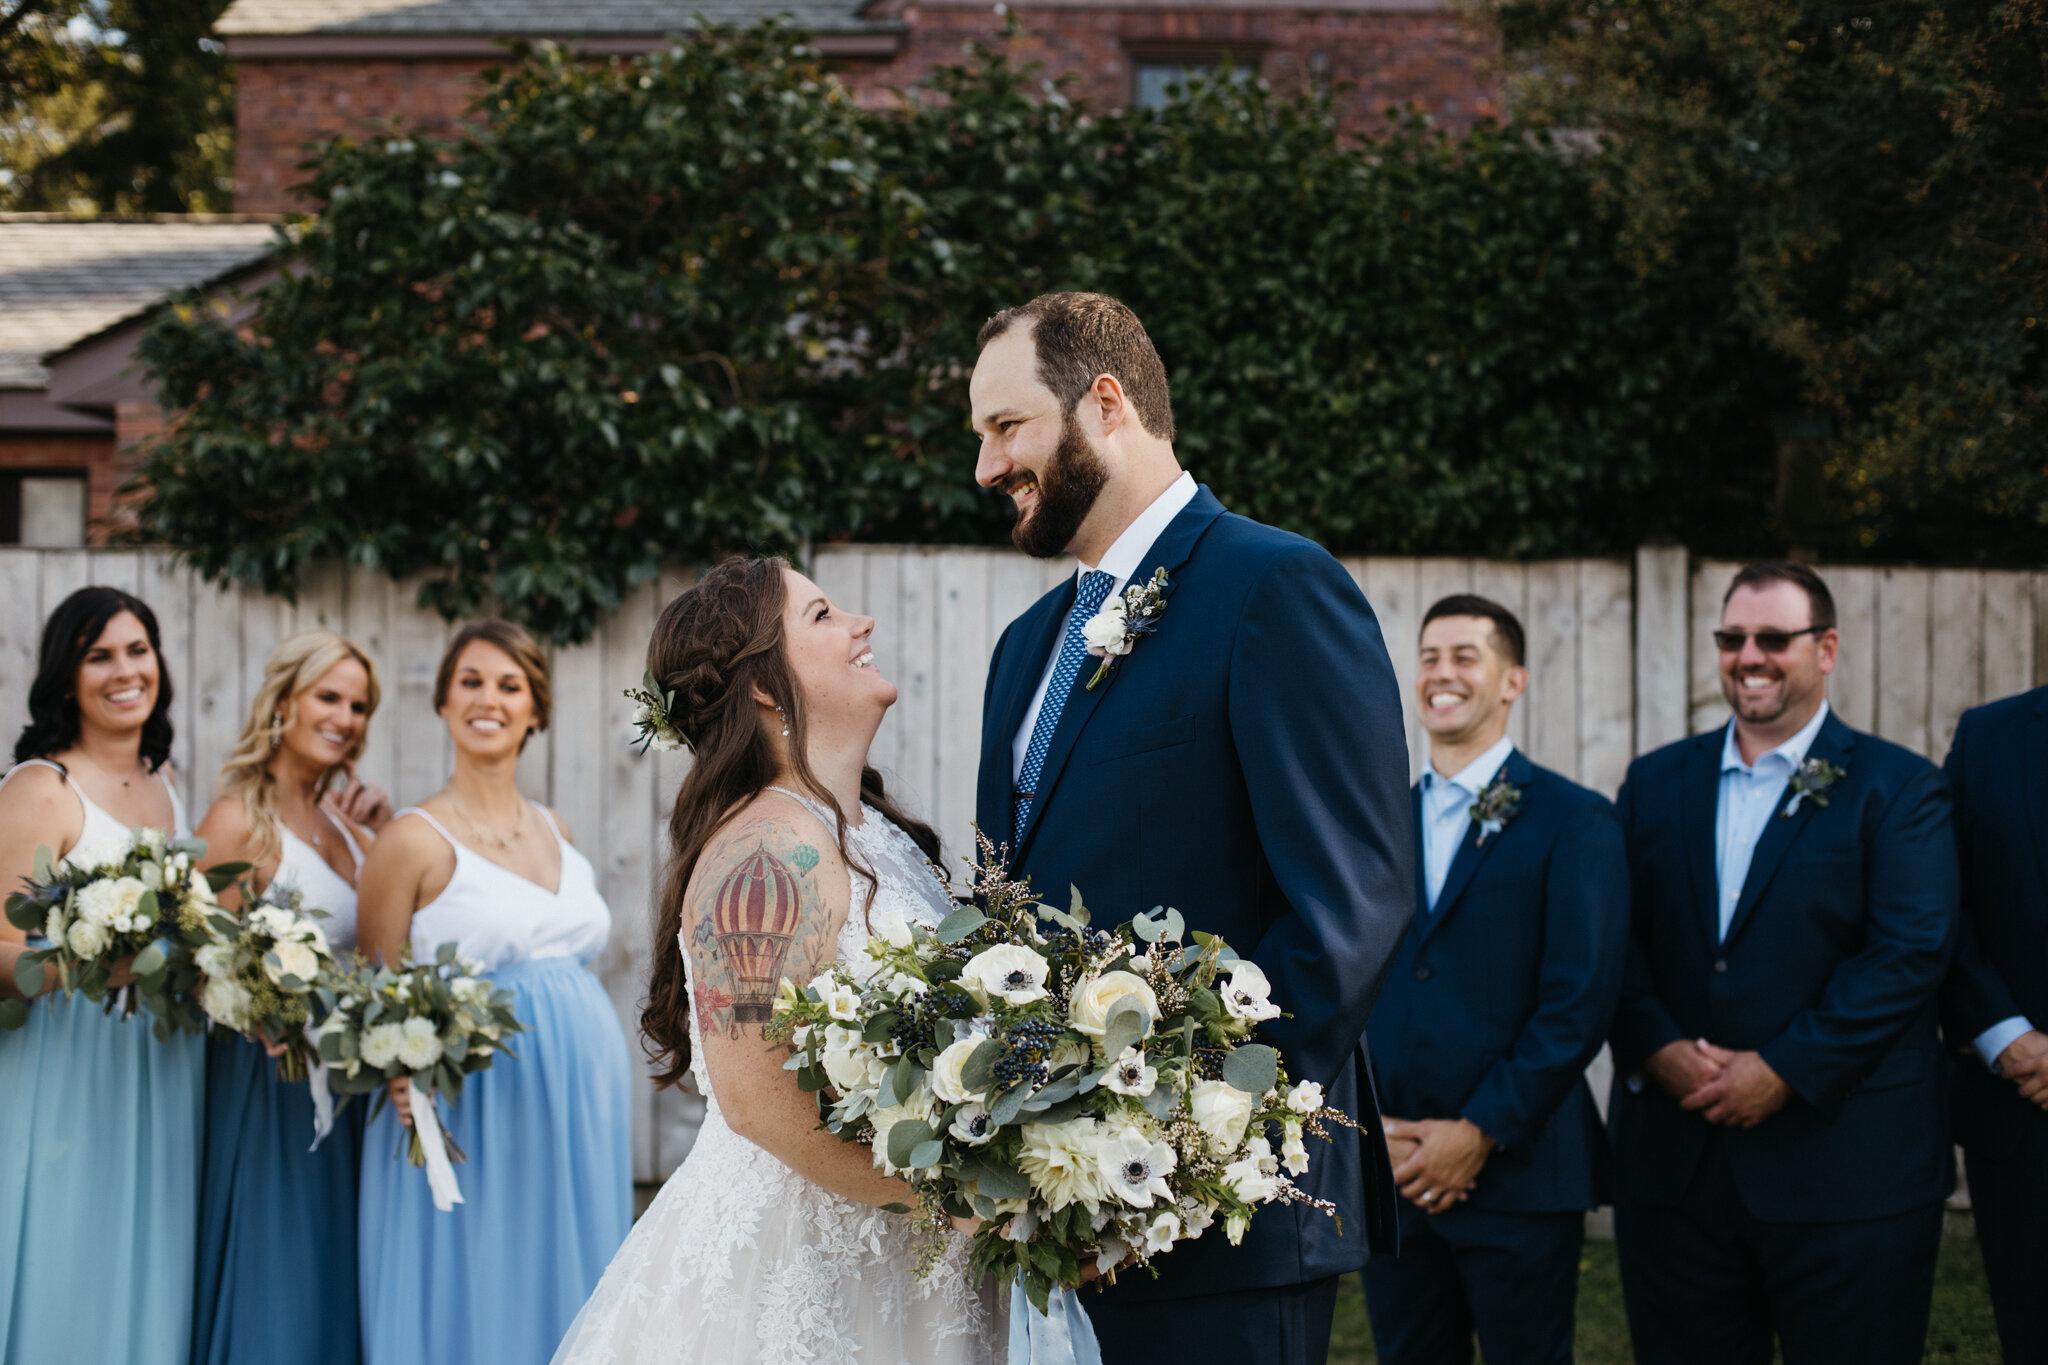 angela_jason_norfolk_wedding-65.jpg